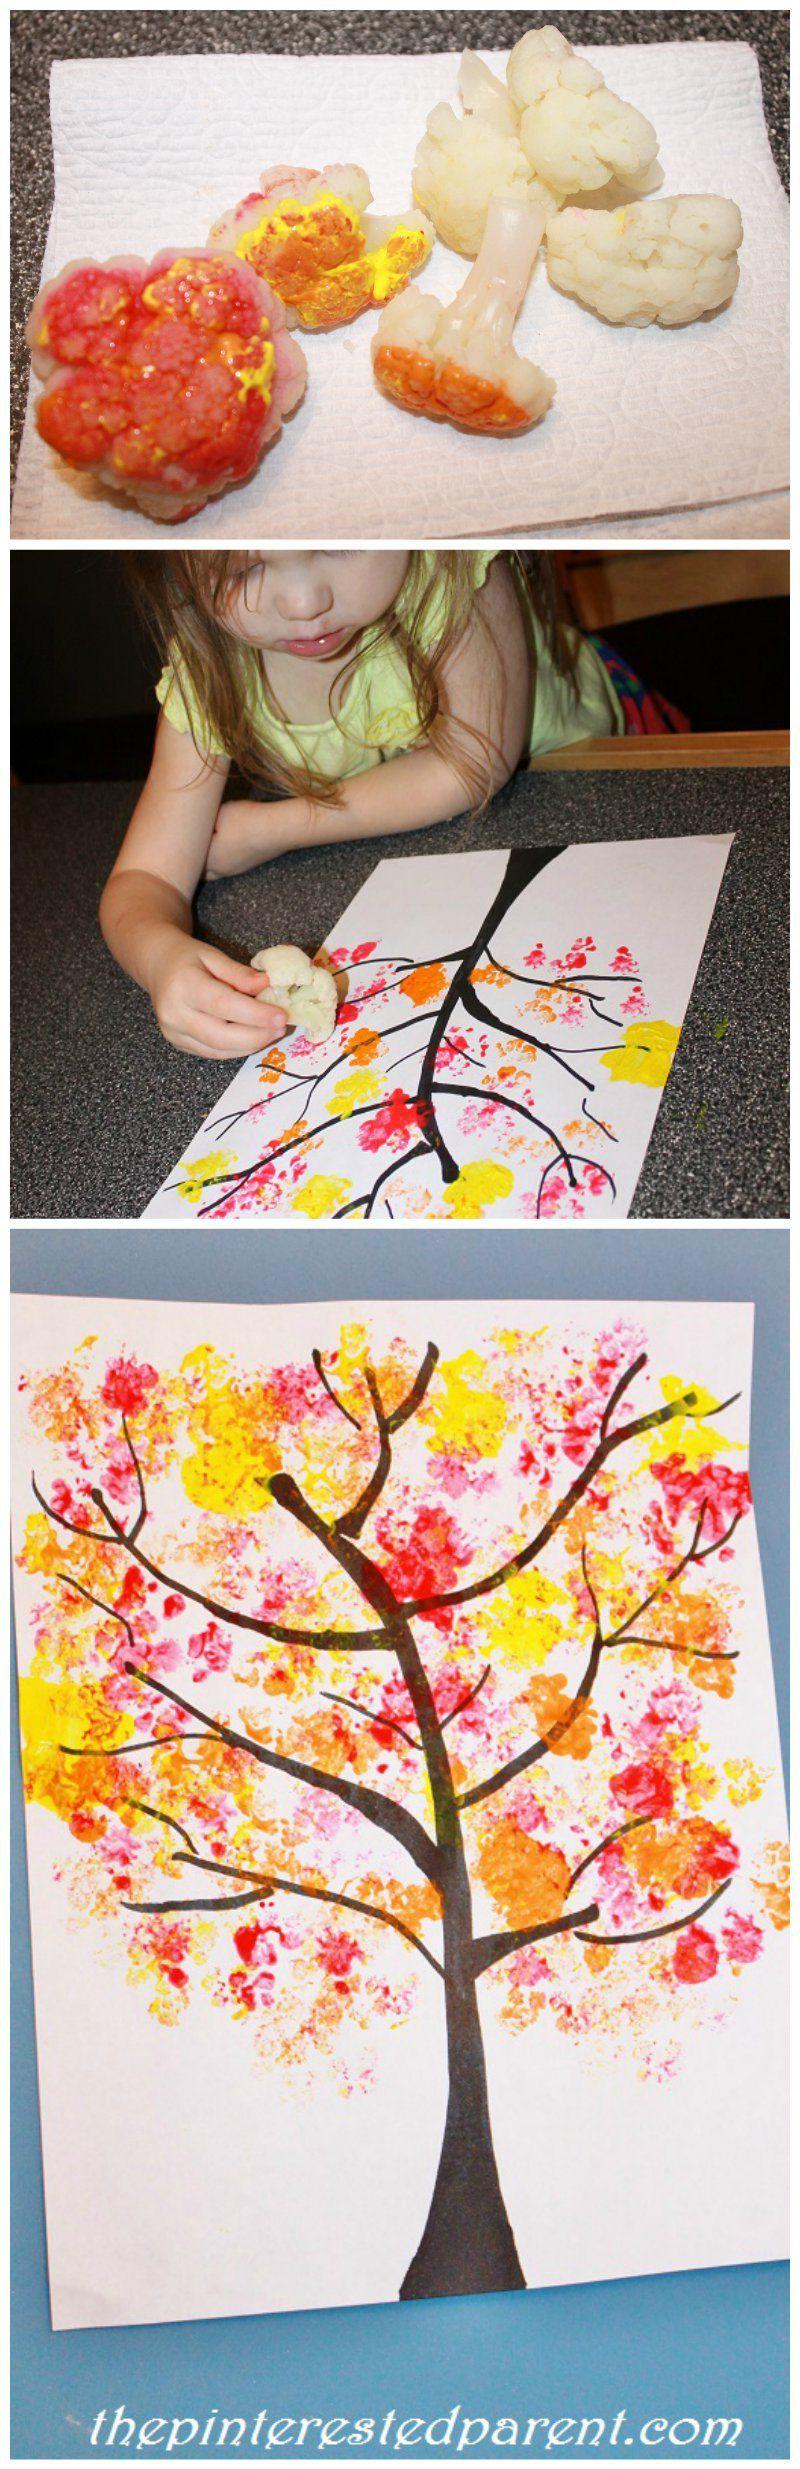 Cauliflower-Stamped-Fall-Tree-Craft